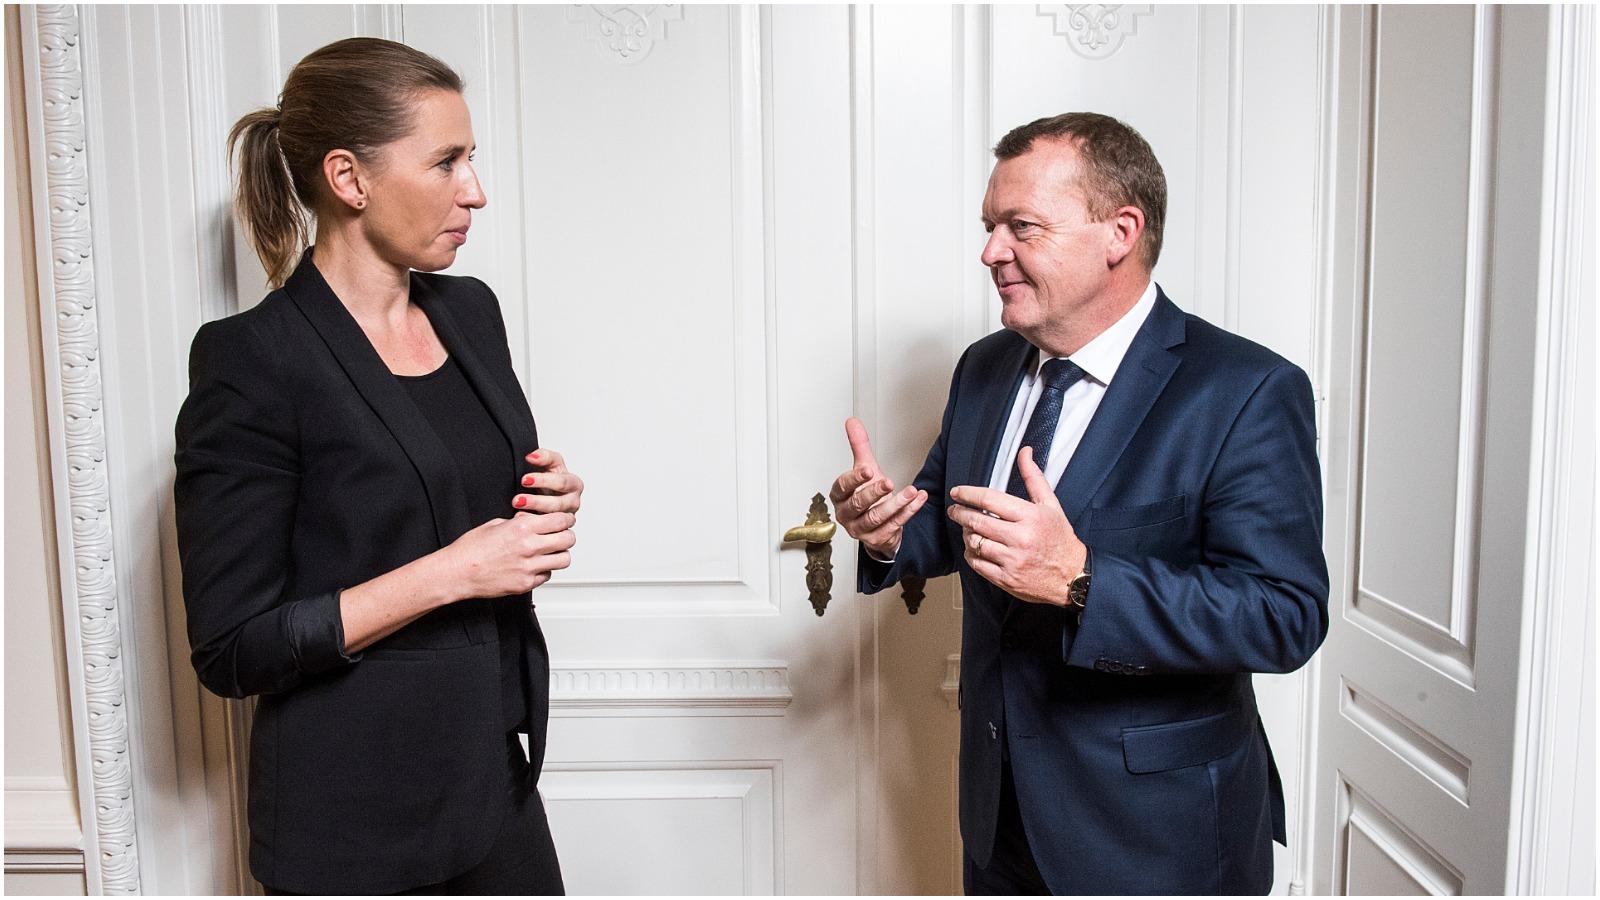 Karen Melchior (RV): Når de er i opposition, kappes Venstre og Socialdemokratiet med Dansk Folkeparti om at være mest EU-fjendsk